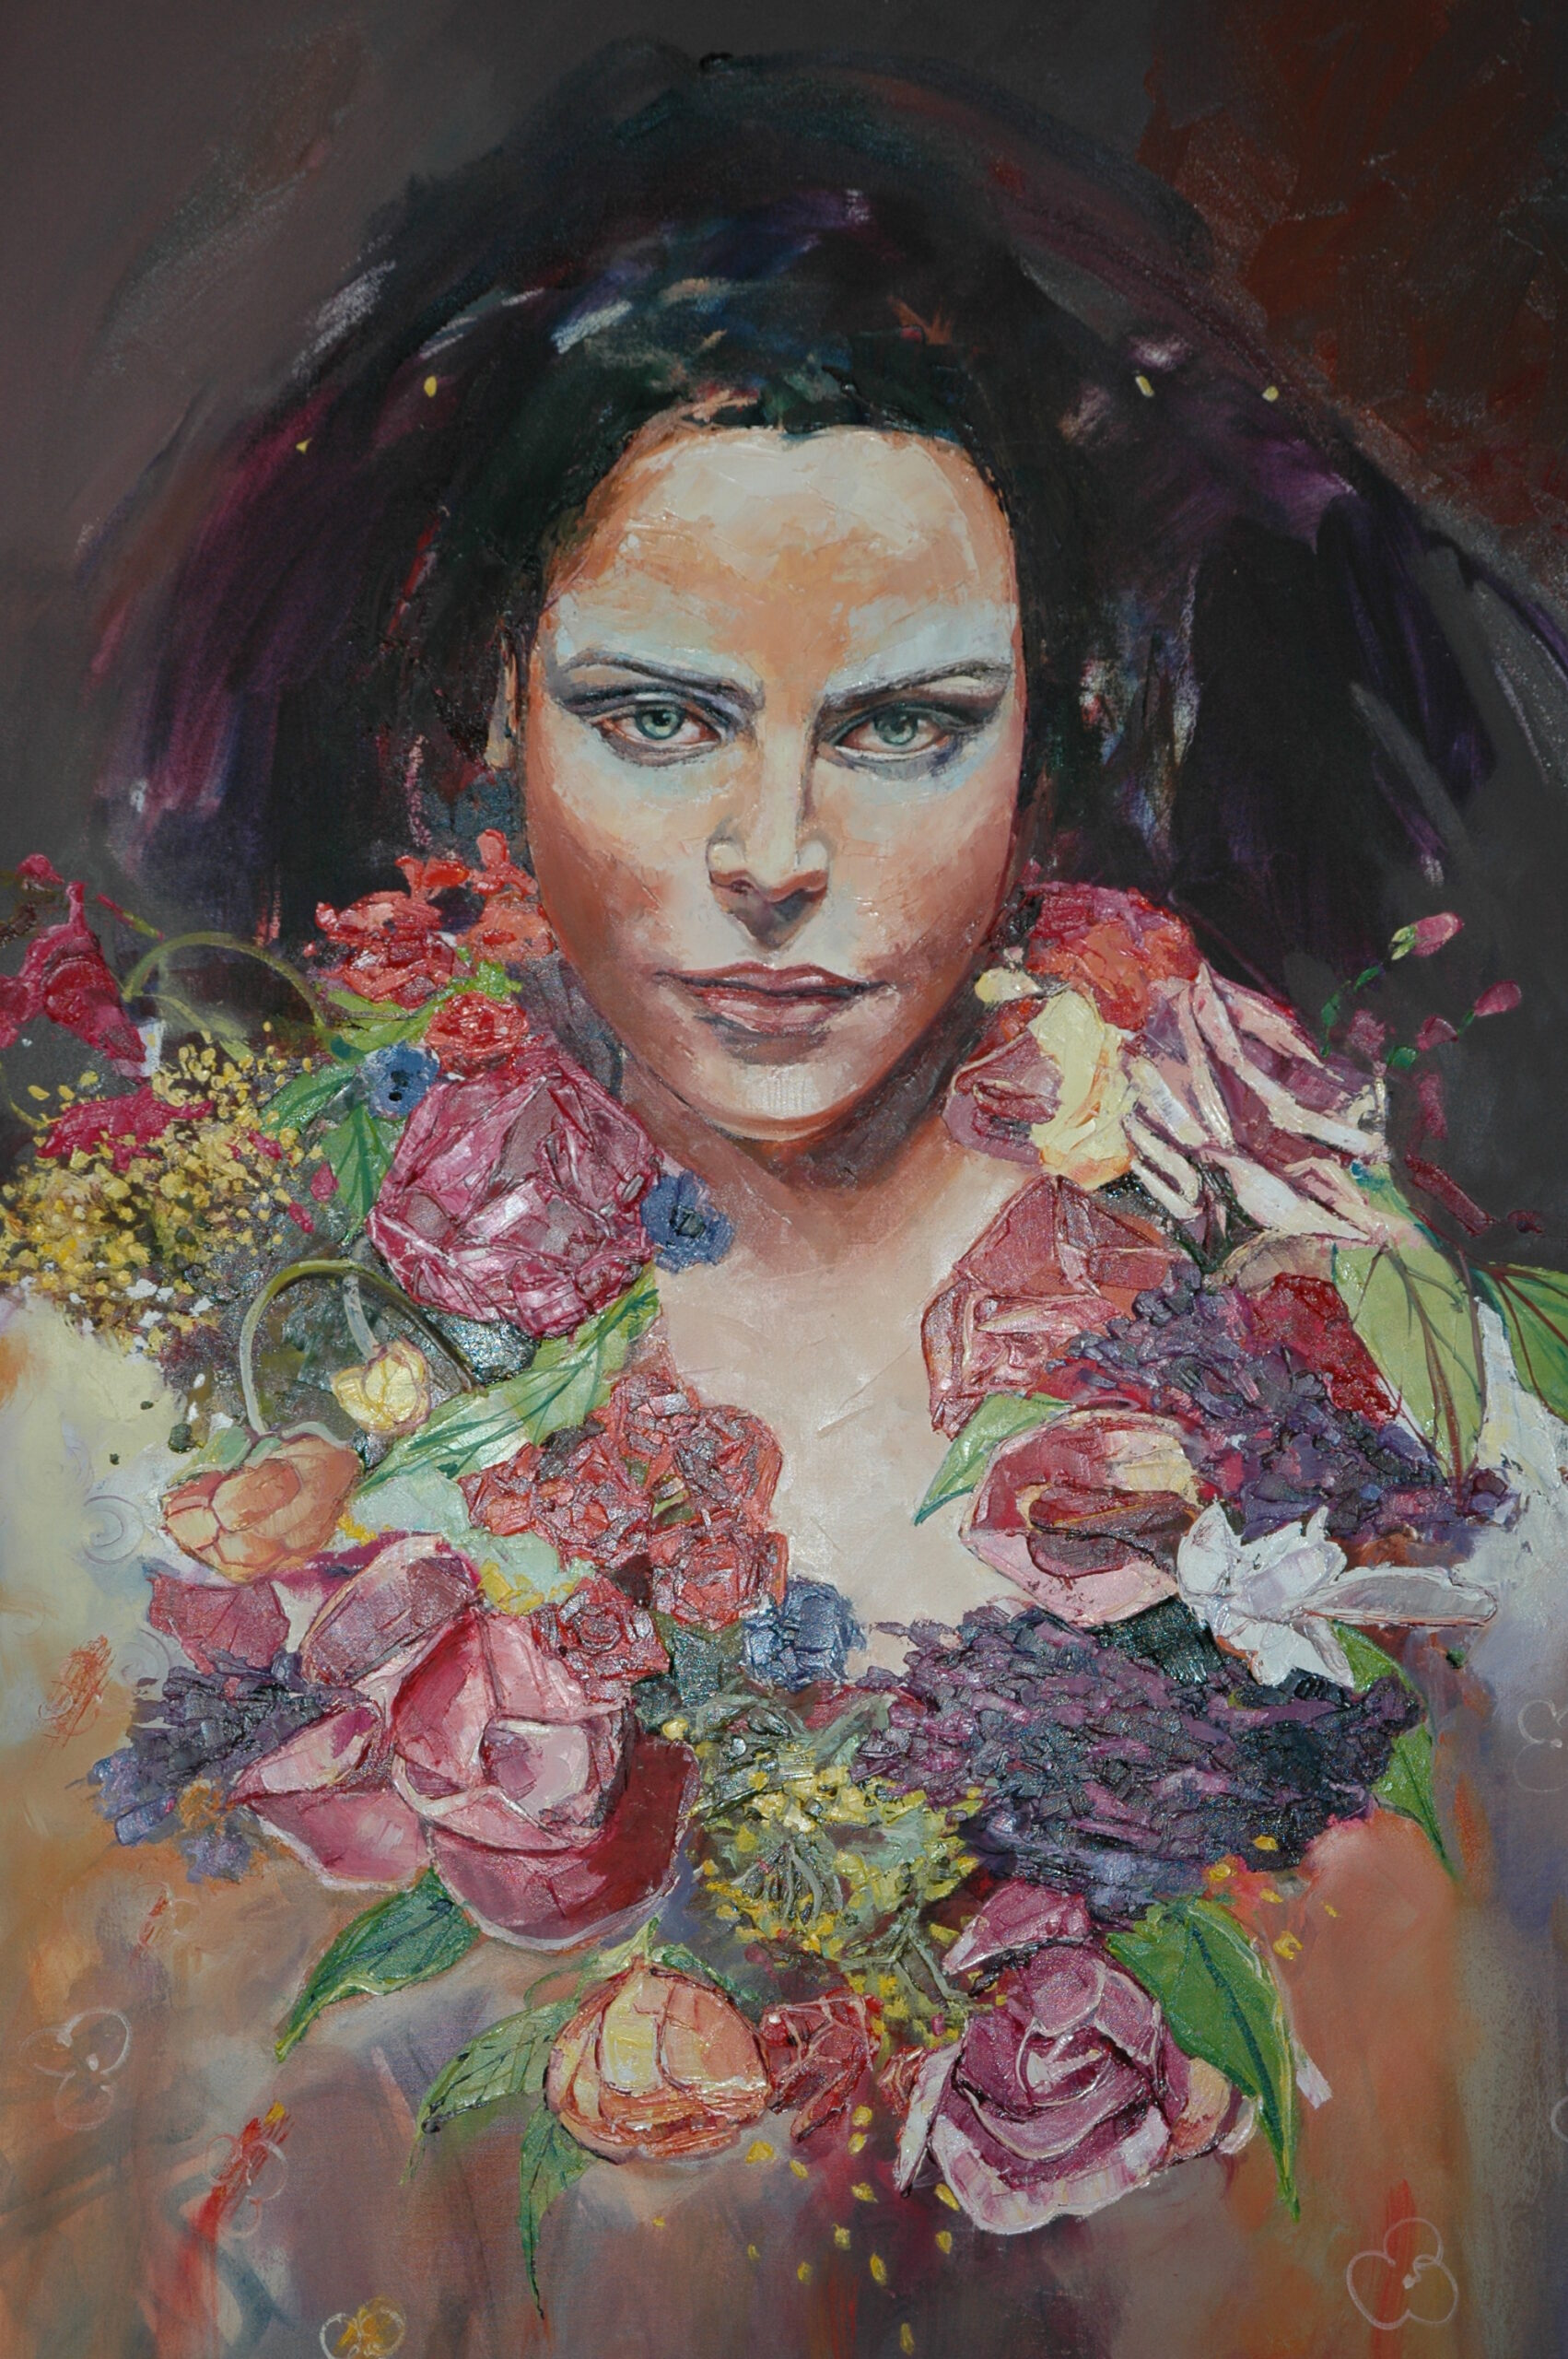 Liz Gray's Wolfgirl oil painting